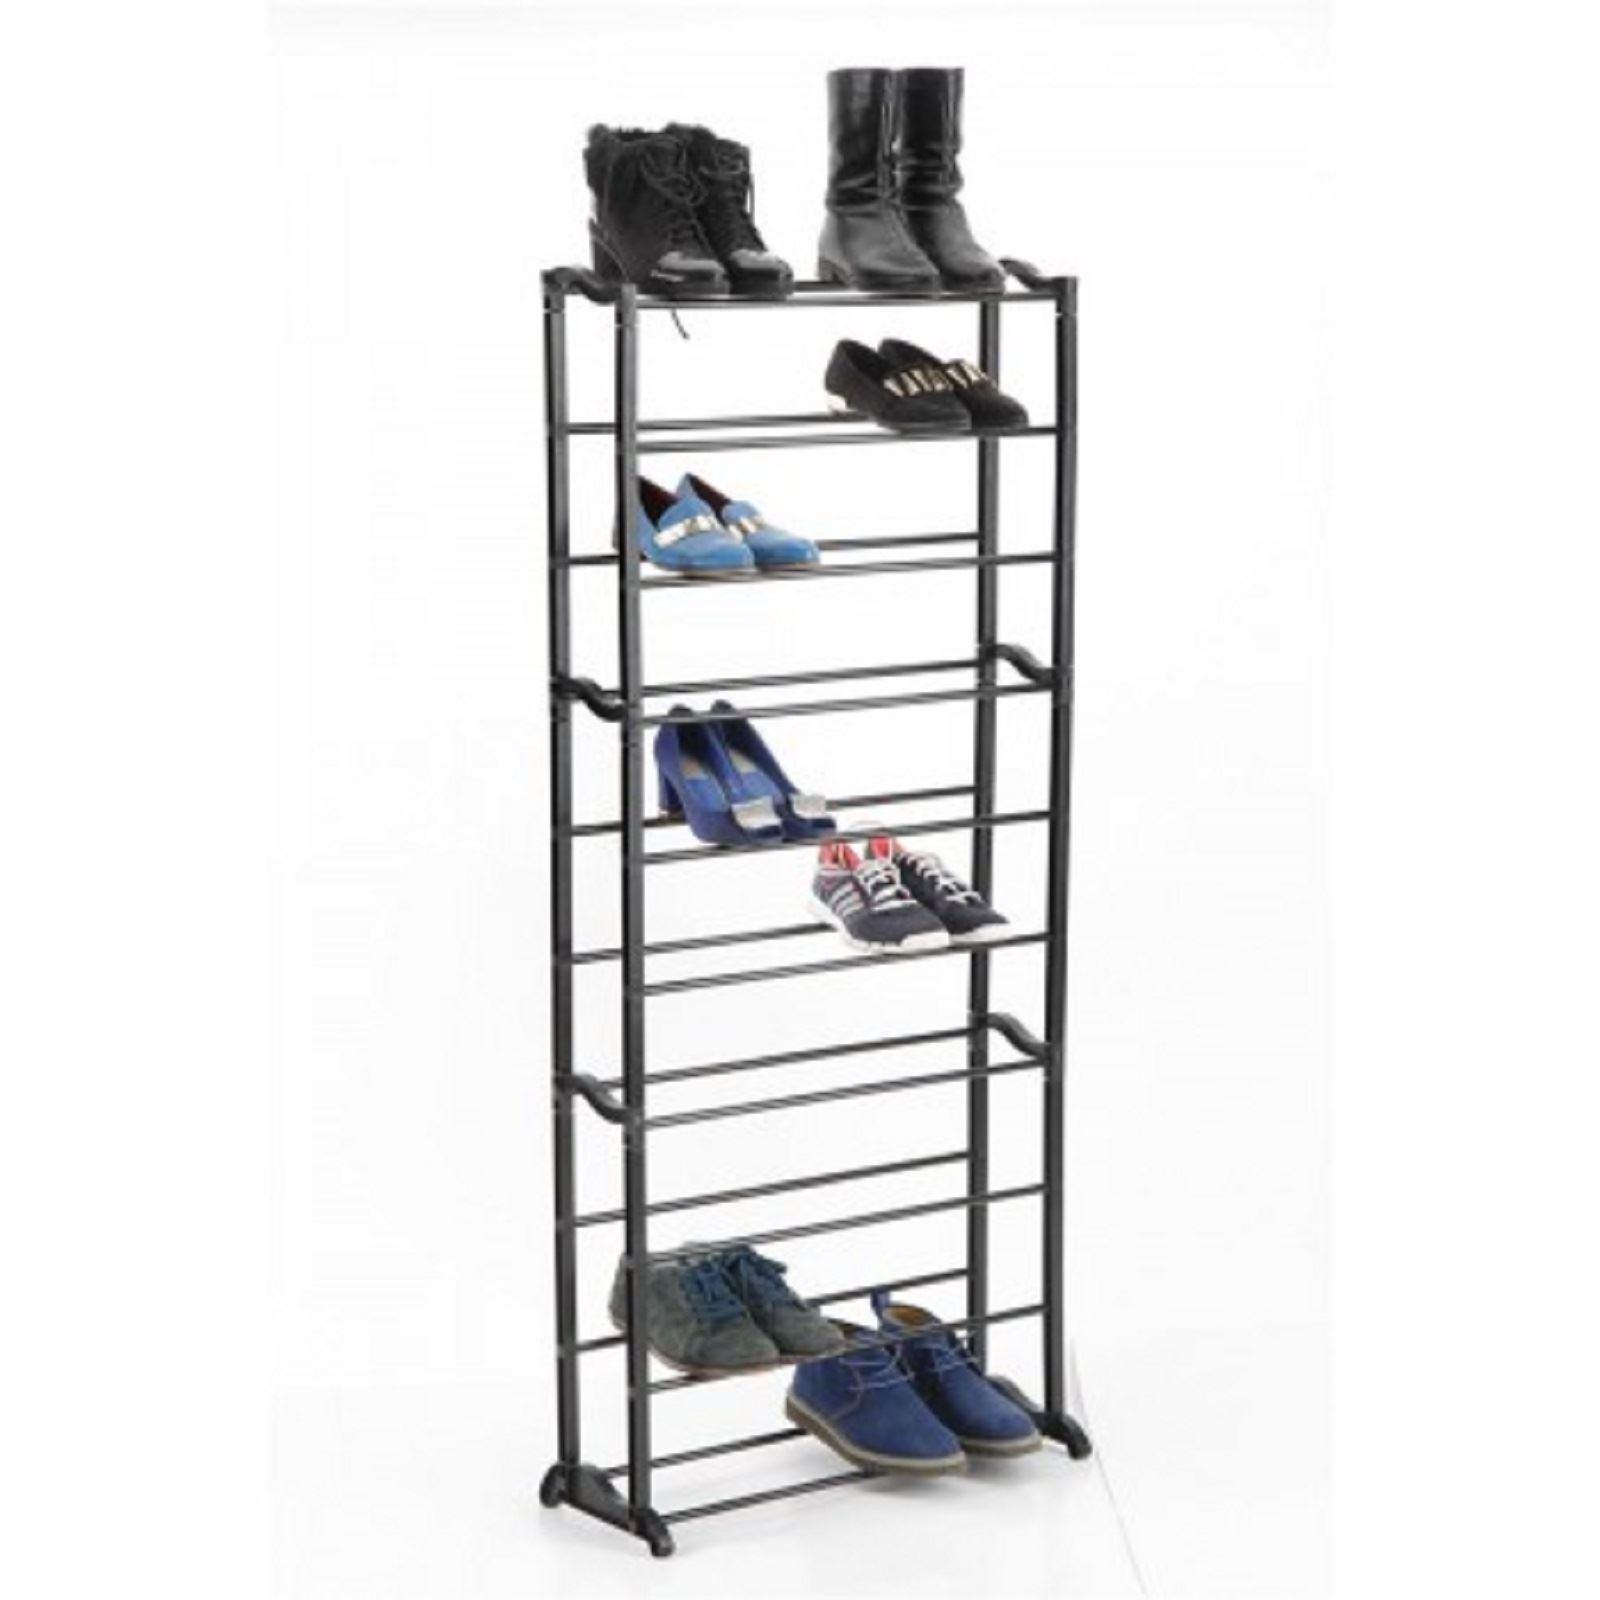 Vinsnai-10-Tier-Shoe-Heels-Trainers-Storage-Rack-Organiser-Shelve-Stand